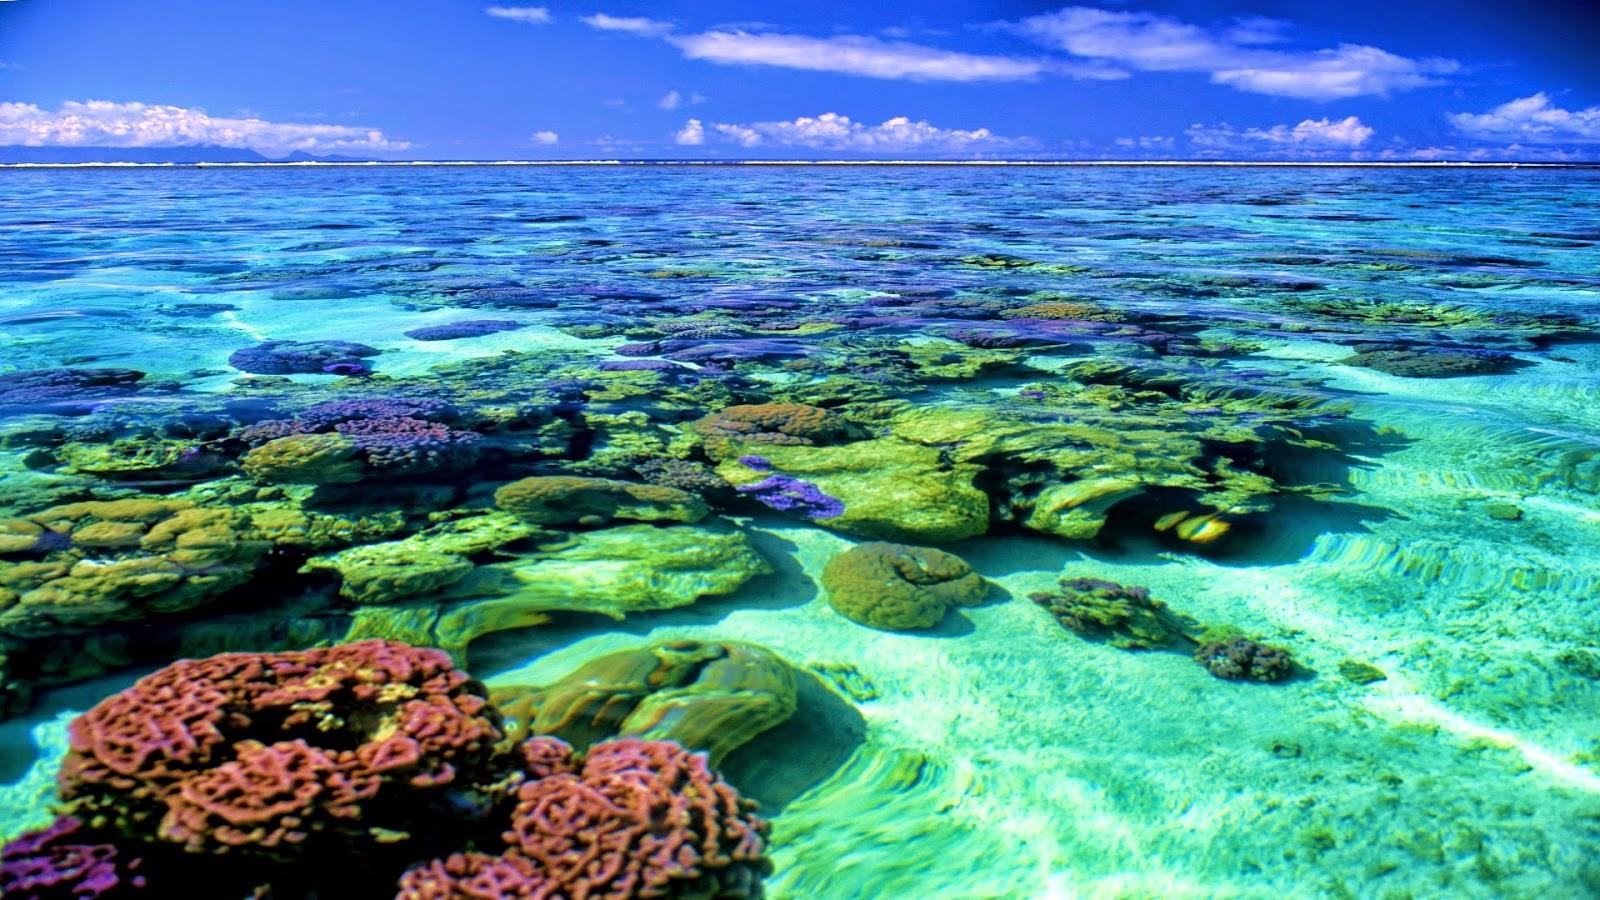 Coral Reef Wallpaper Hd - 1600x900 - Download HD Wallpaper ...